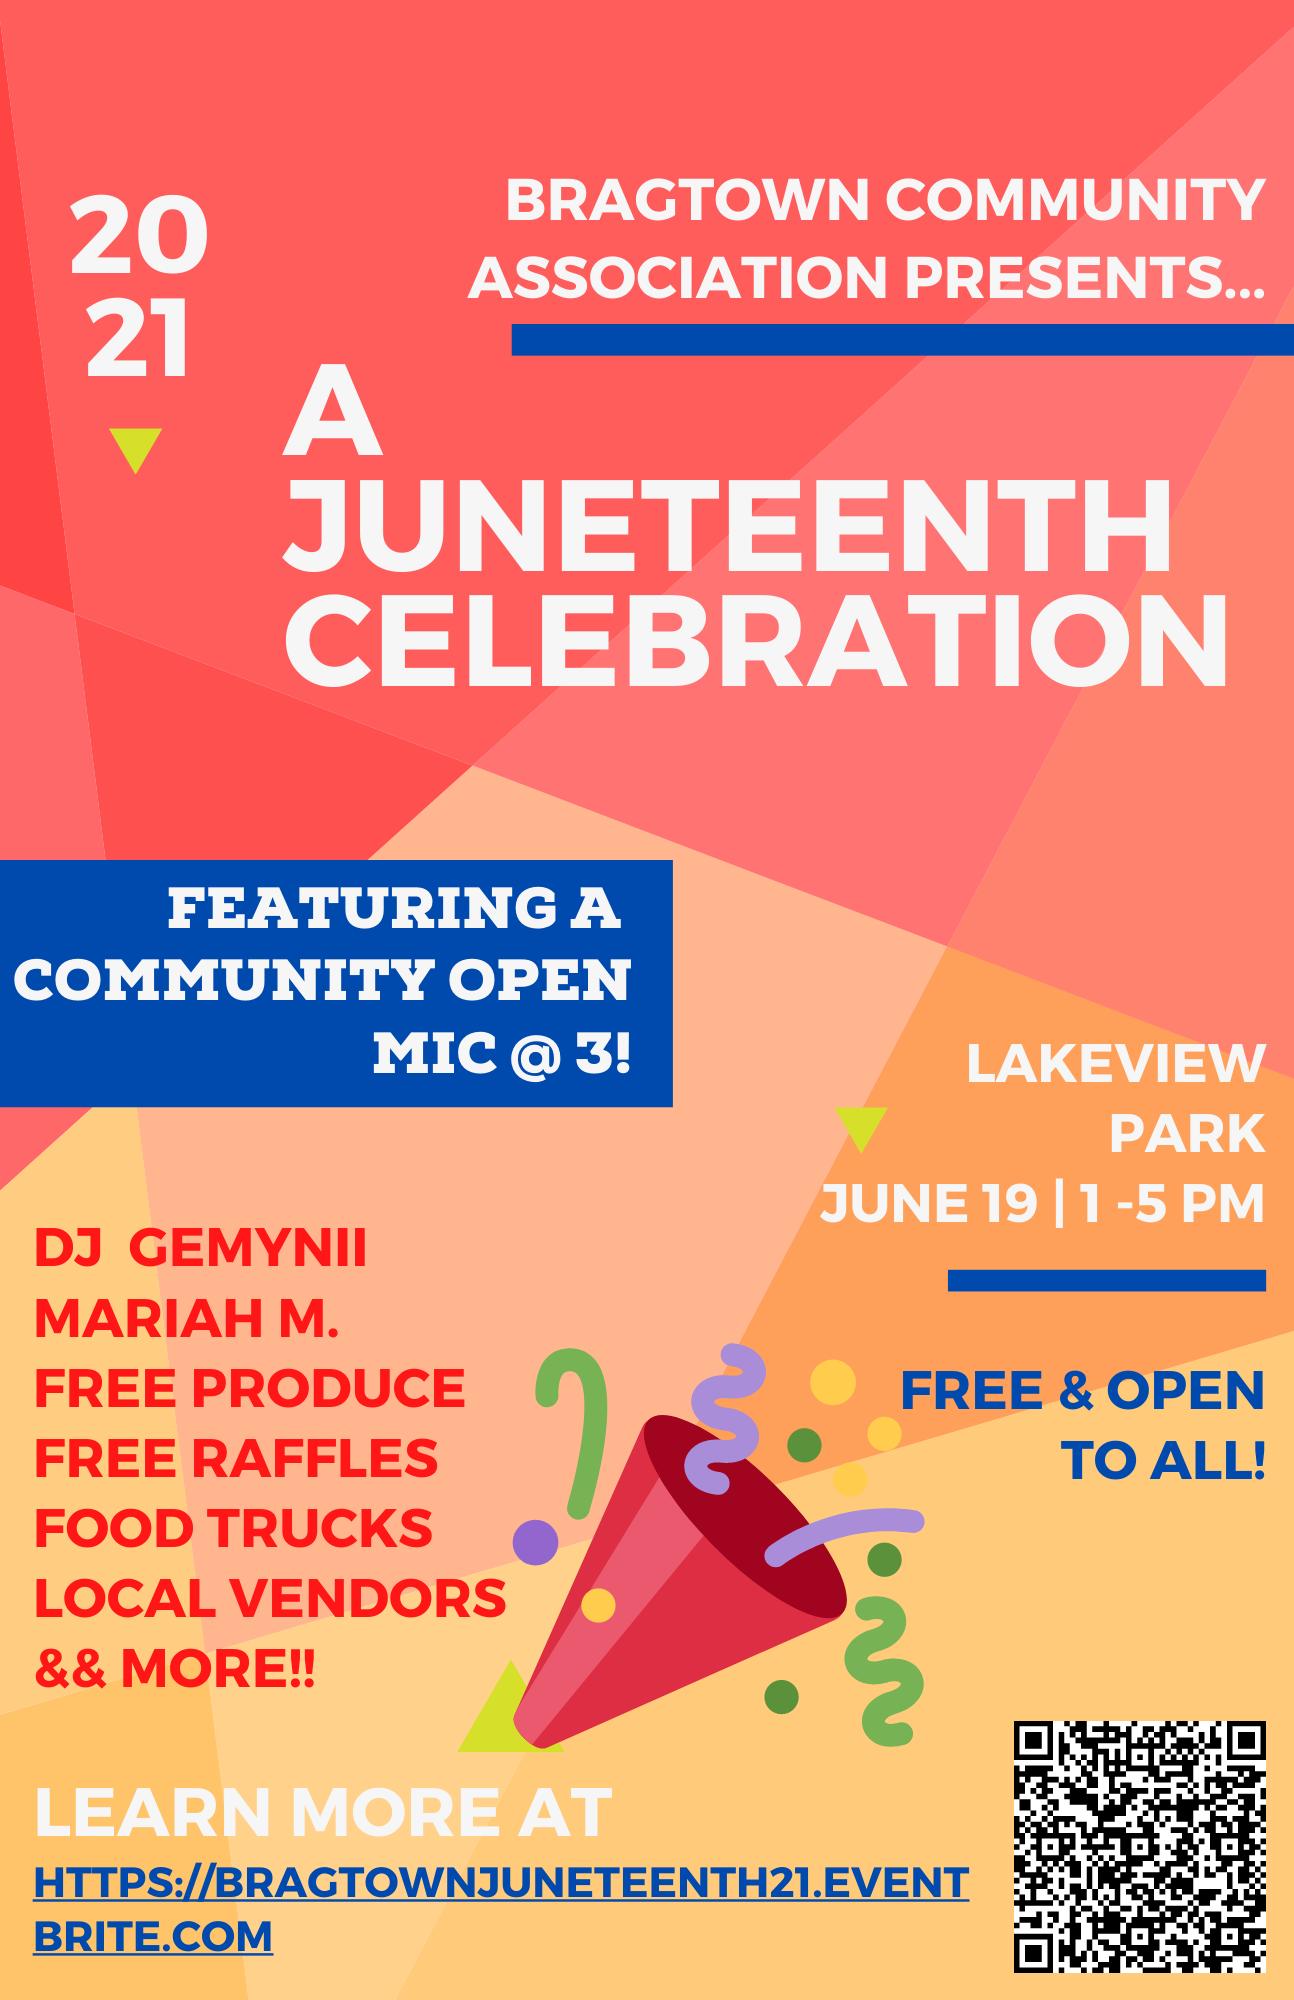 A Juneteenth Celebration flyer image